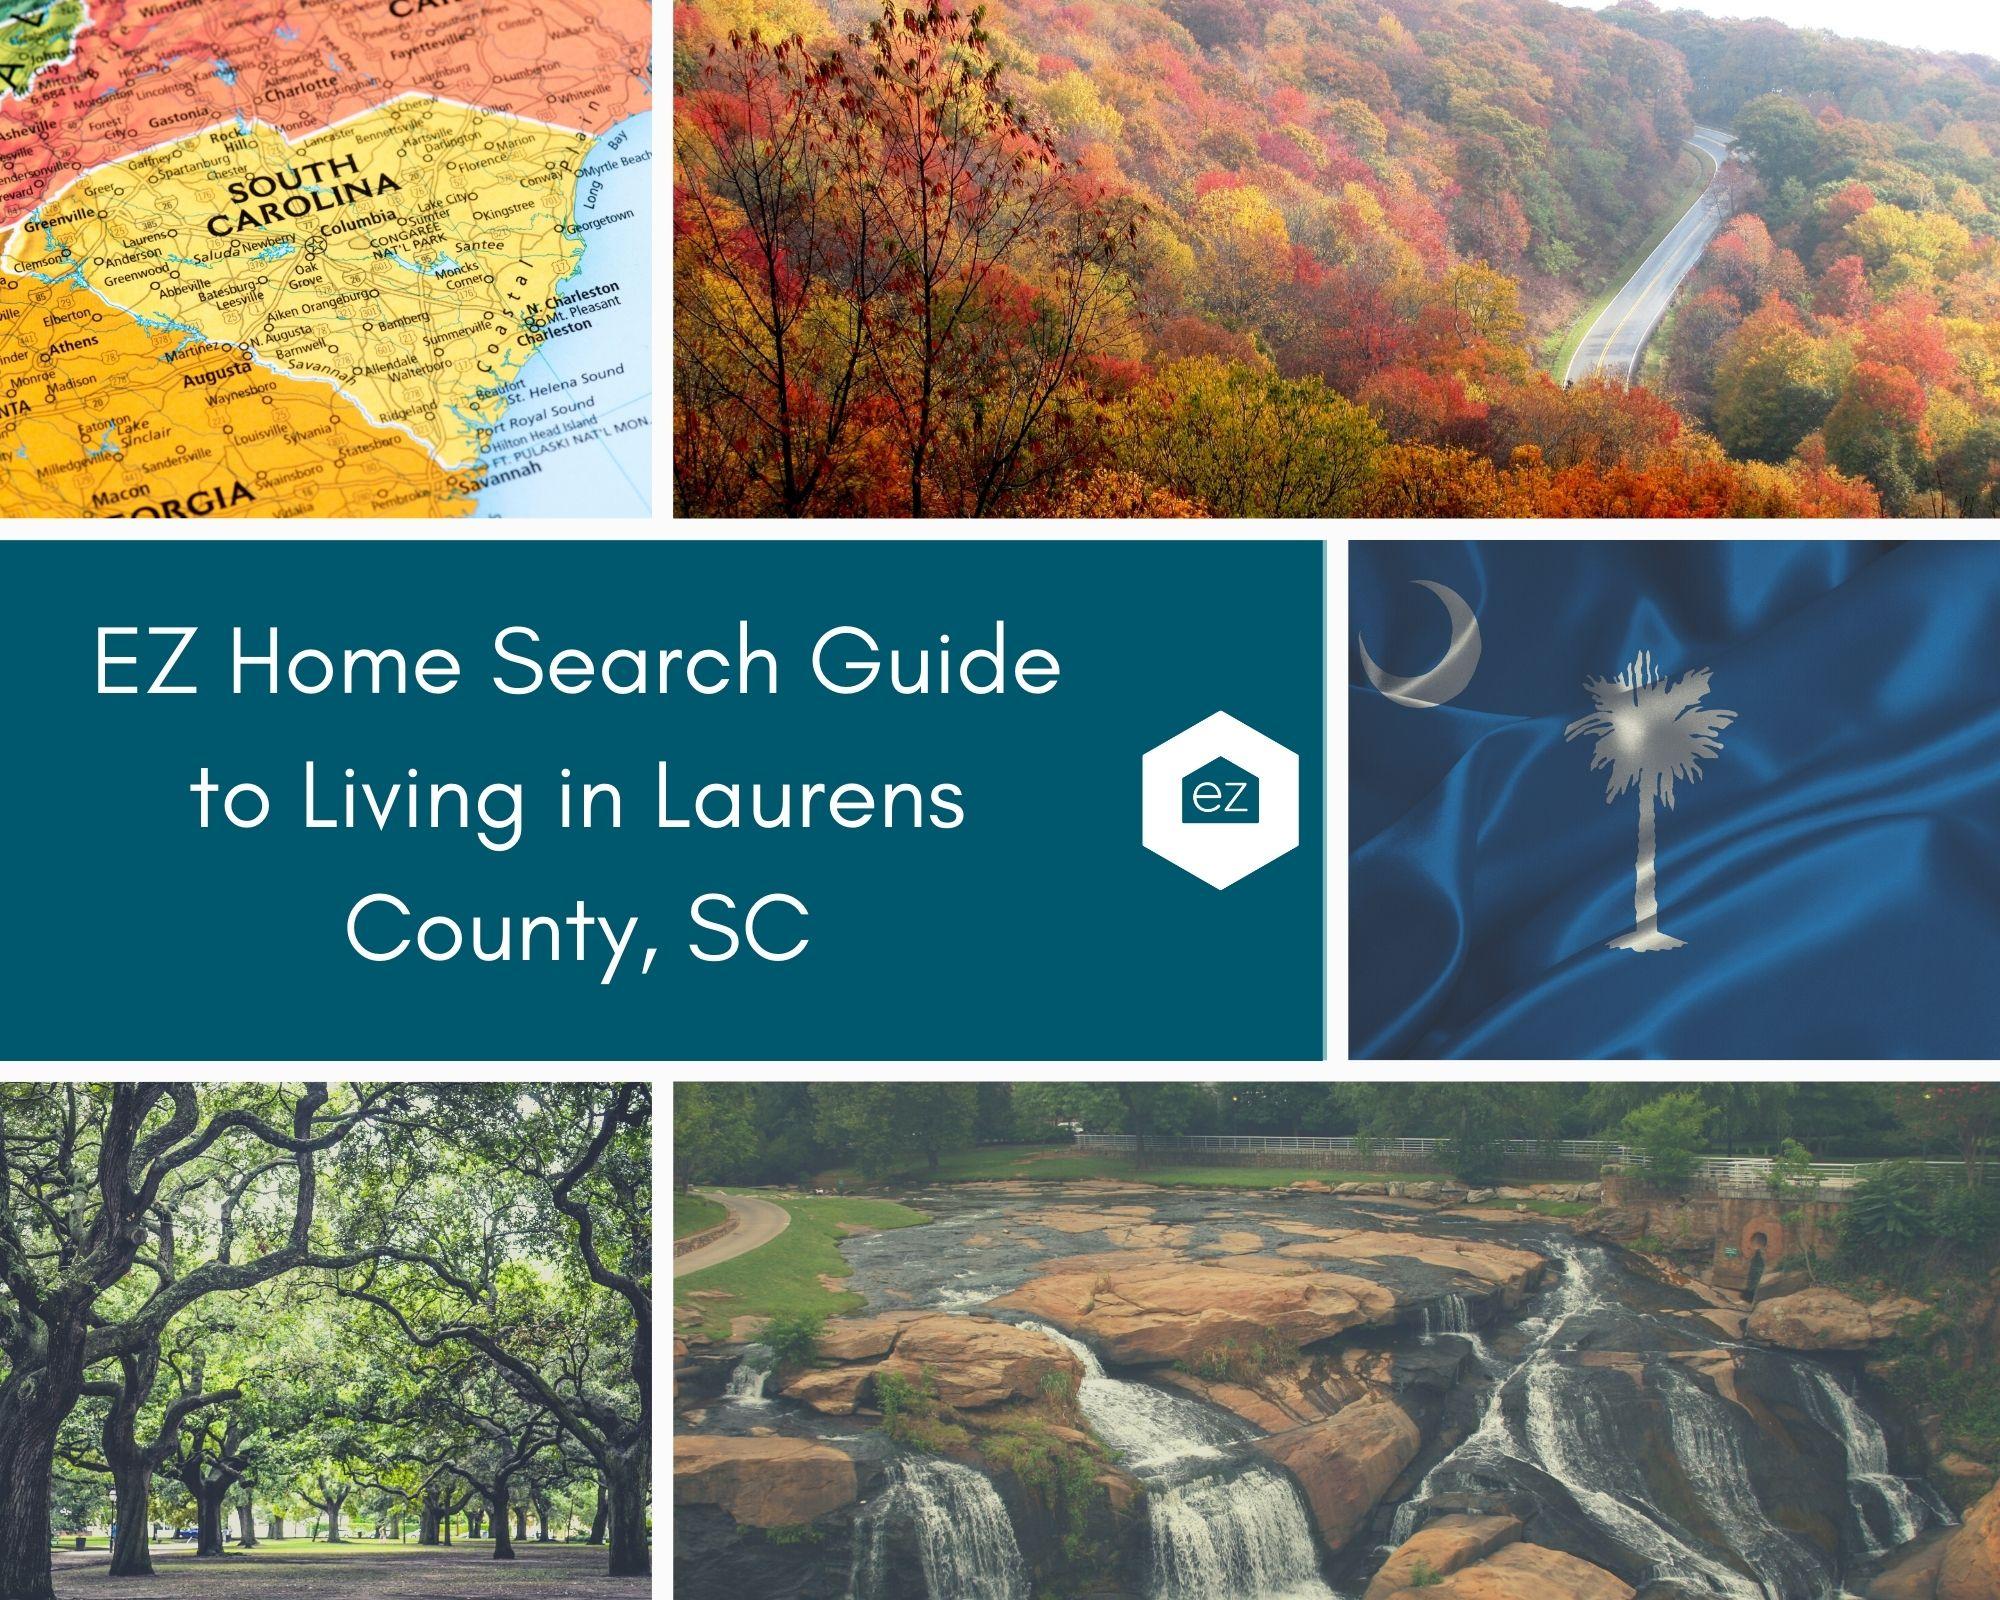 Photos taken from South Carolina